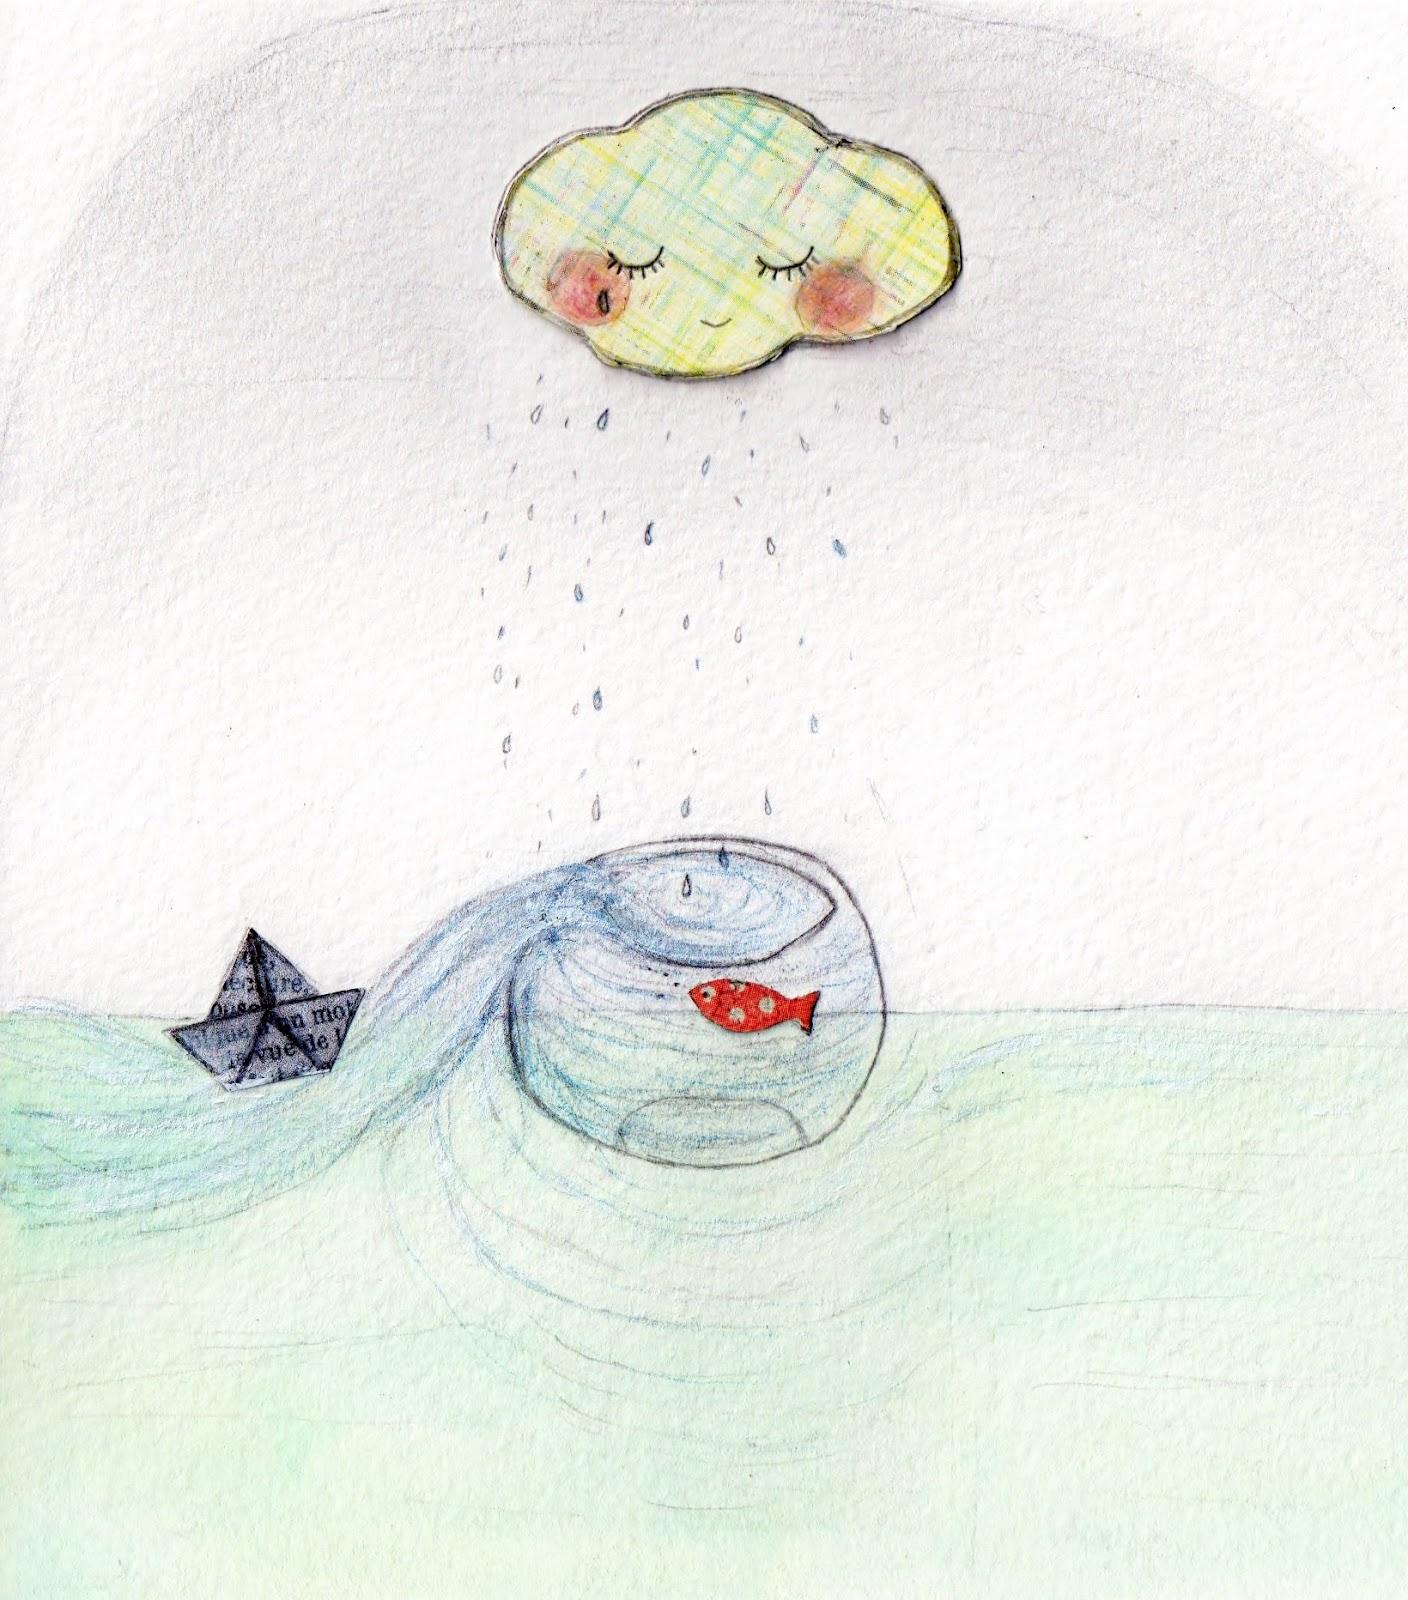 Baptistine mesange juillet 2012 for Bocal poisson rouge